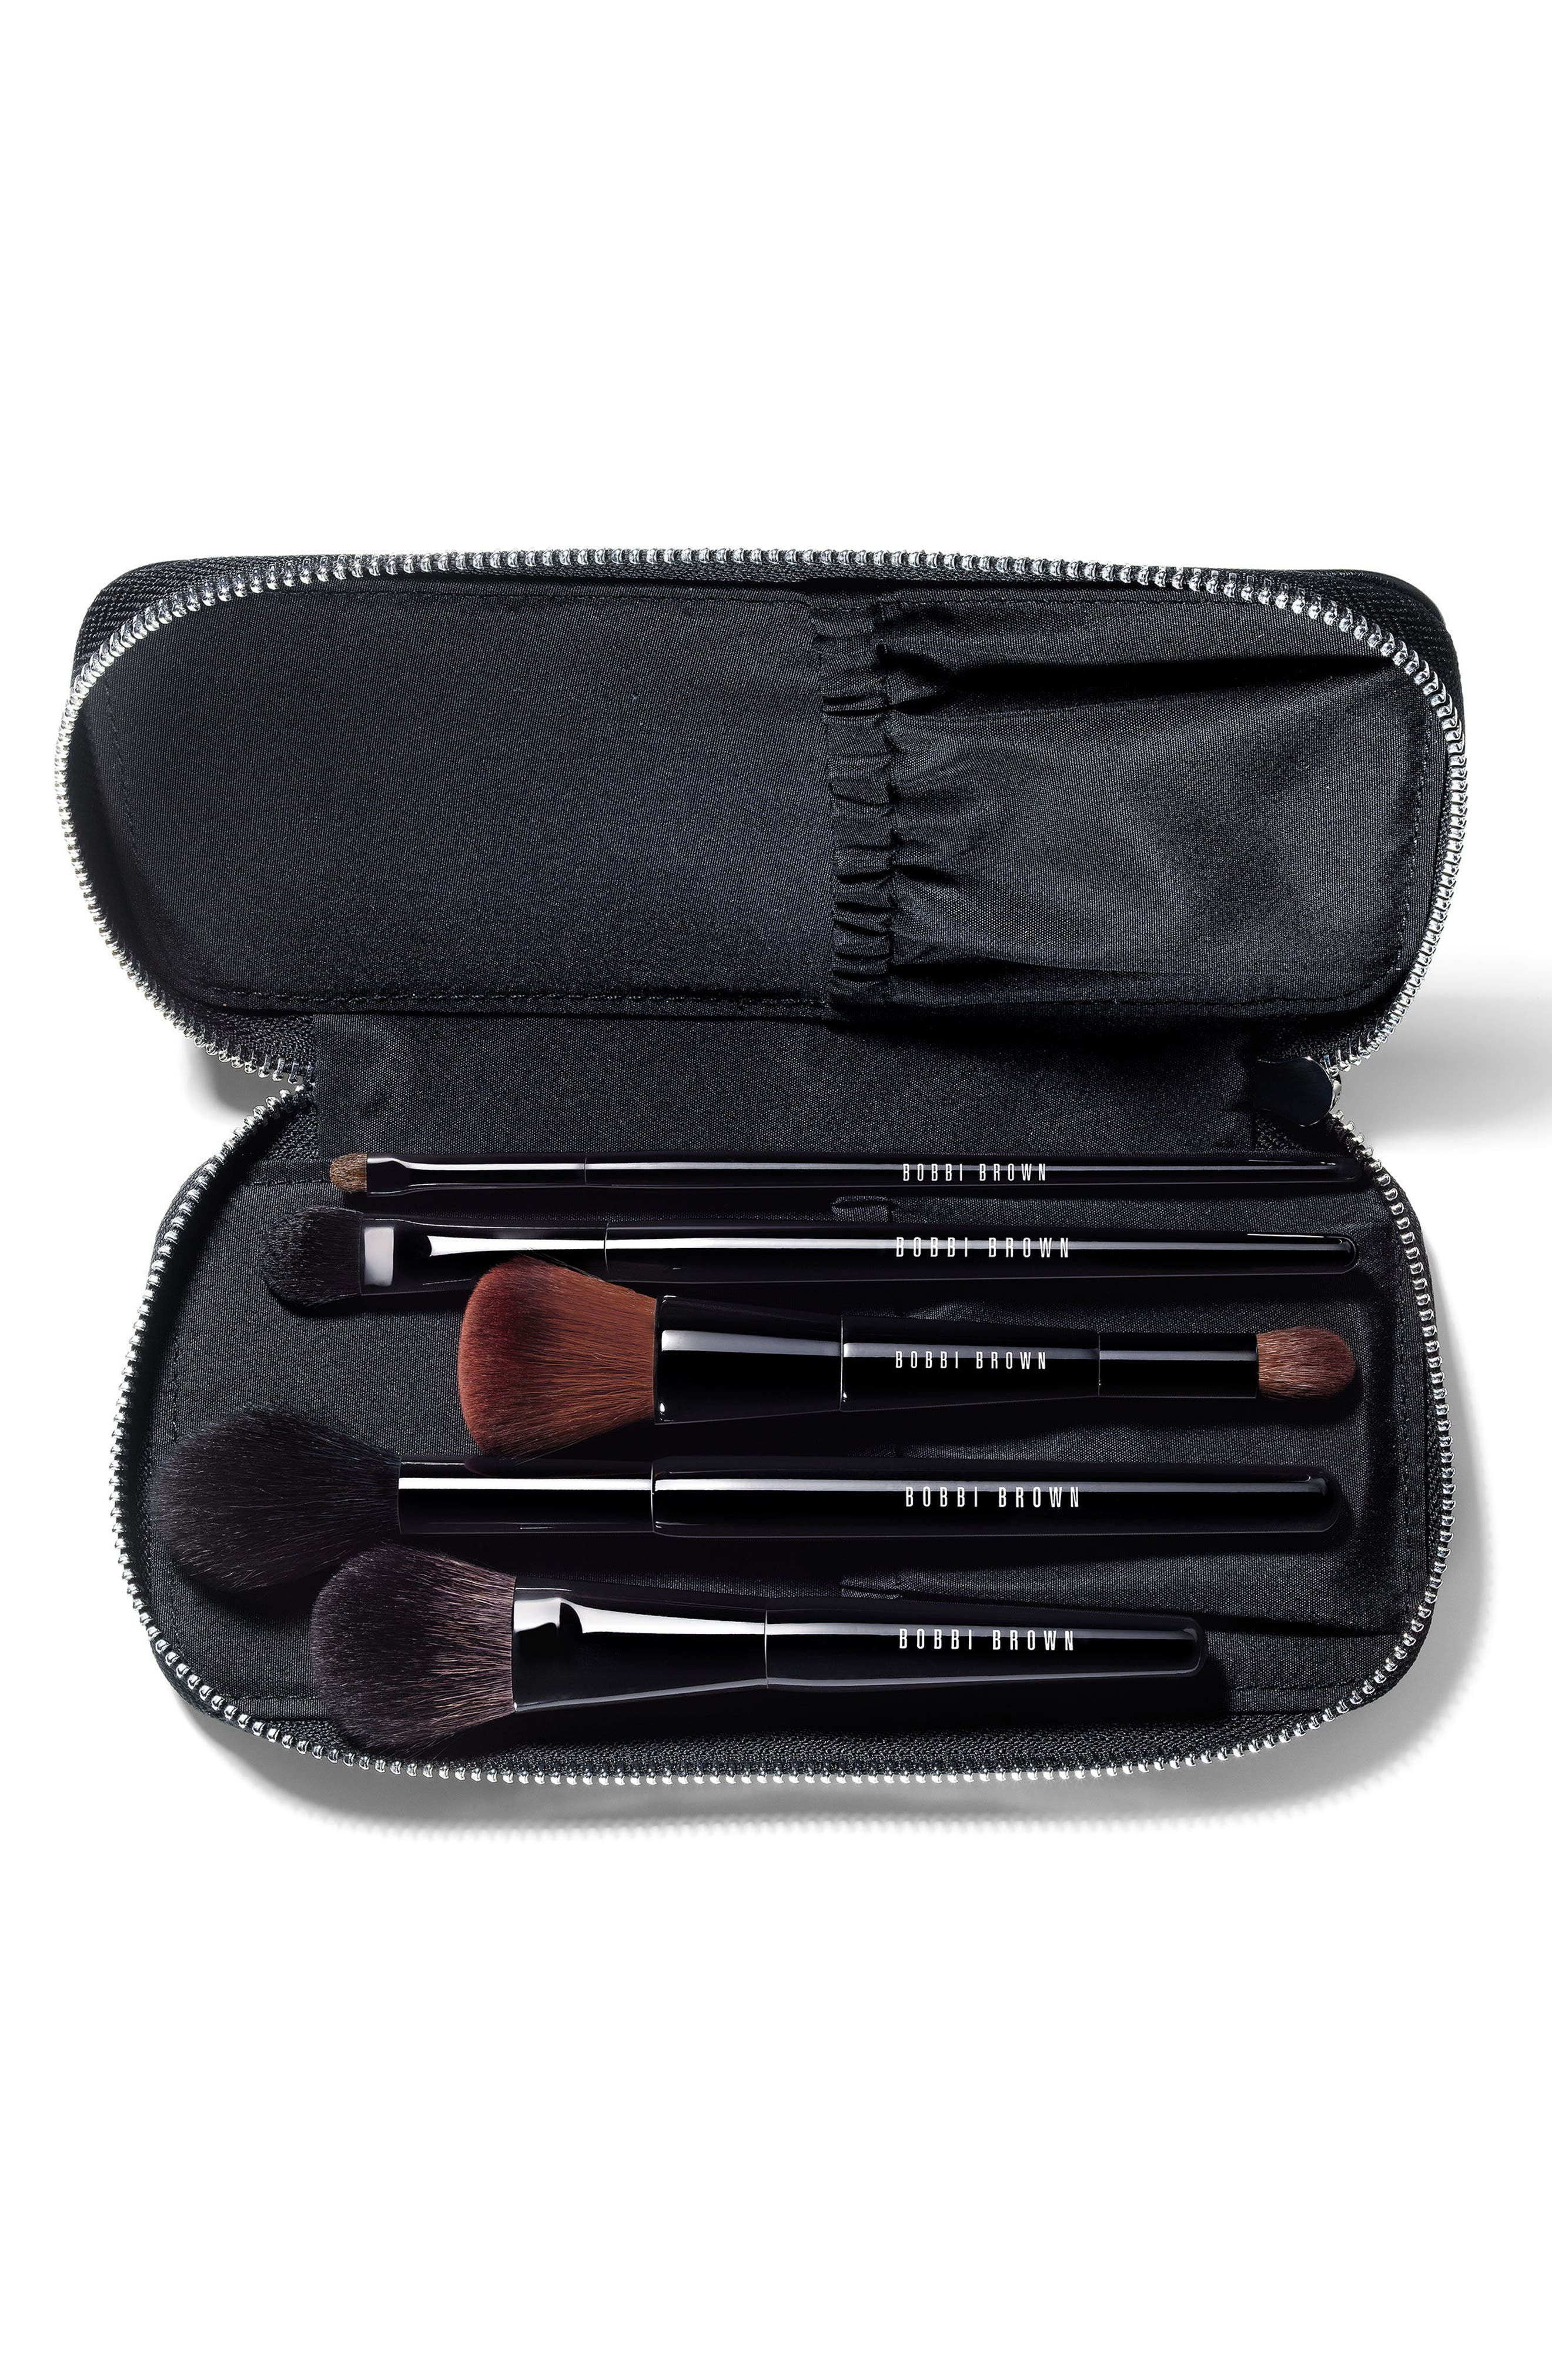 Alternate Image 1 Selected - Bobbi Brown Bobbi on Trend Pro Brushes Collection (Nordstrom Exclusive) ($264 Value)